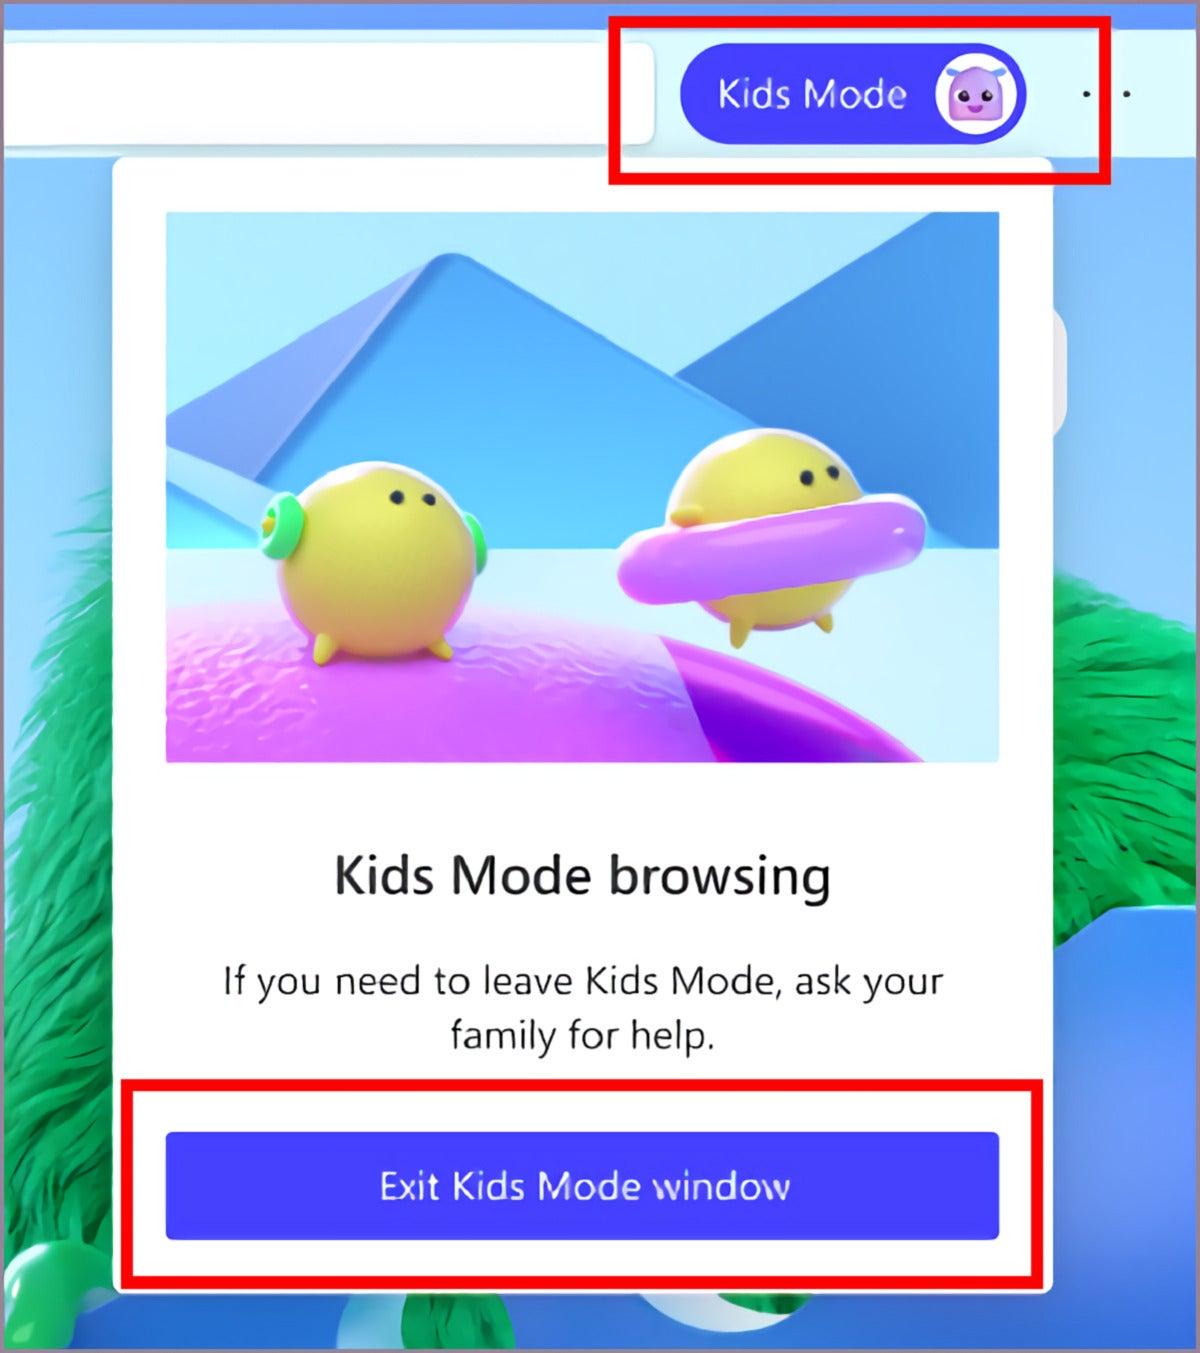 microsoft edge kids mode exit